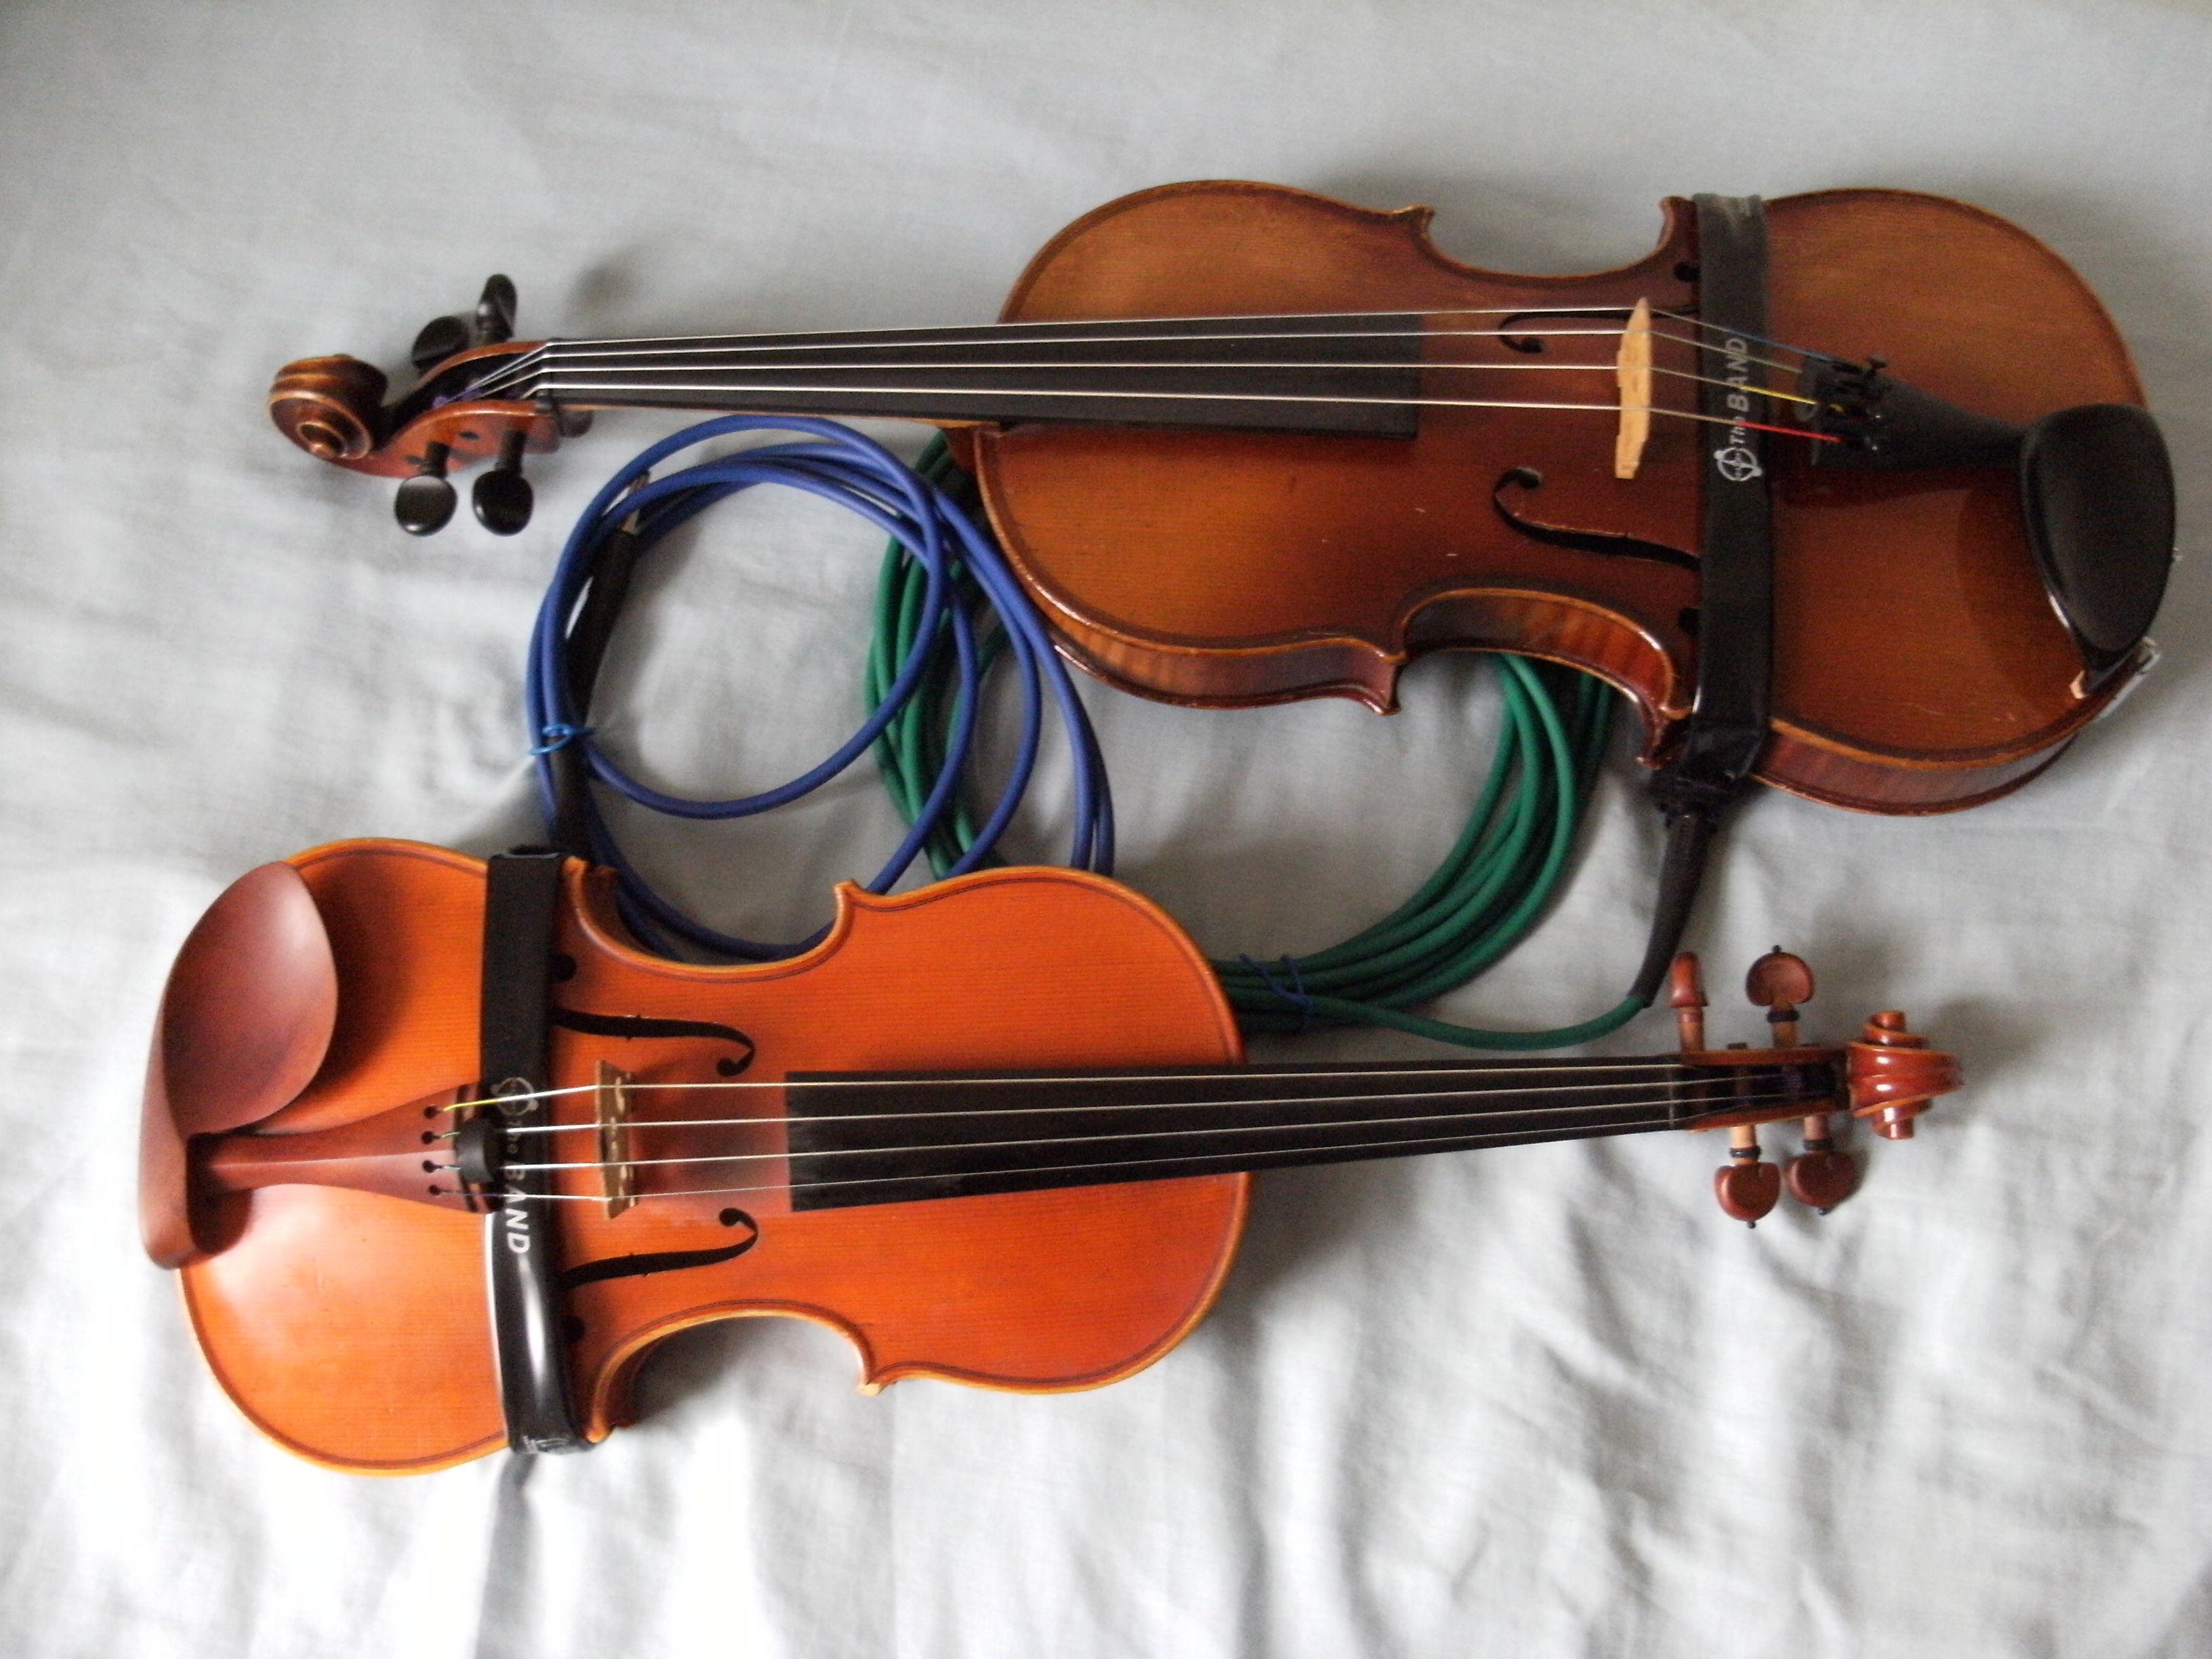 Martin Ash's violin and viola pickups, on the instruments